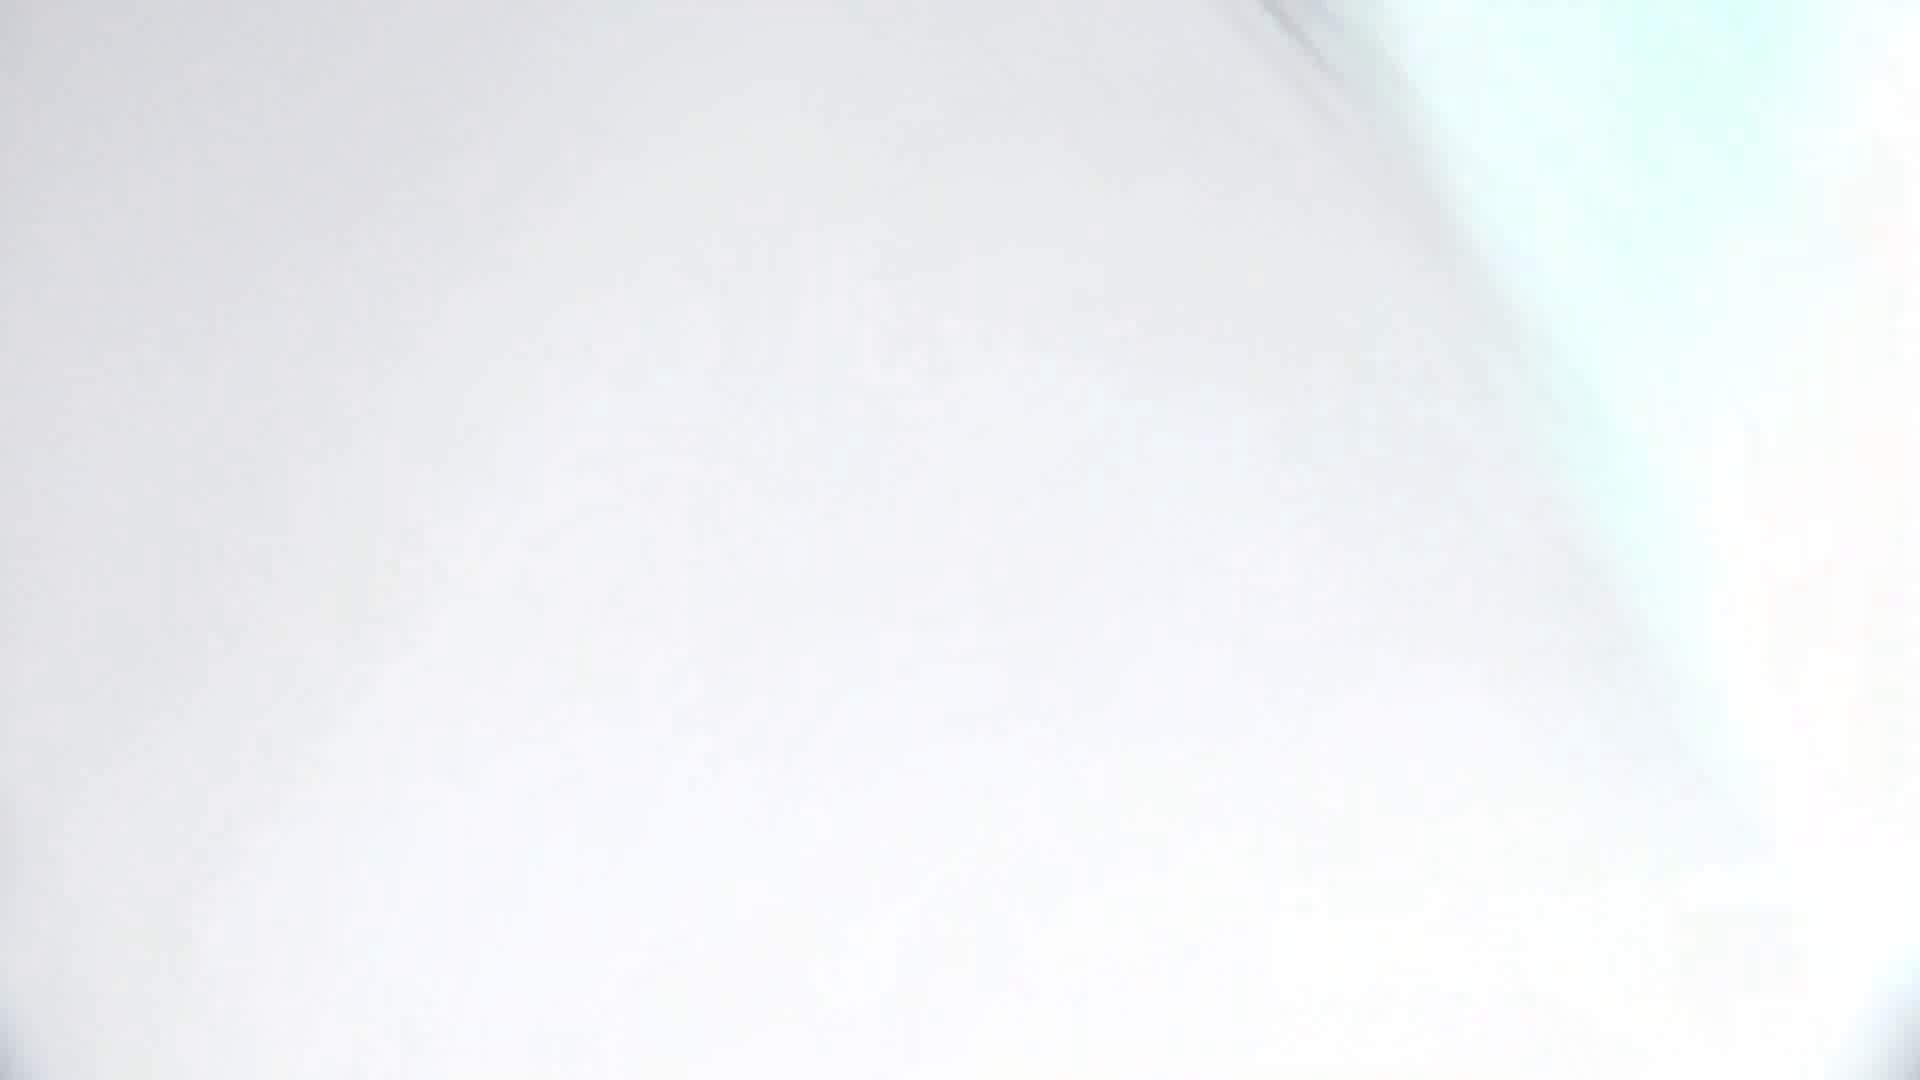 vol.25三十時間潜り、一つしか出会えない完璧桃尻編 byお銀 美人 えろ無修正画像 92pic 56